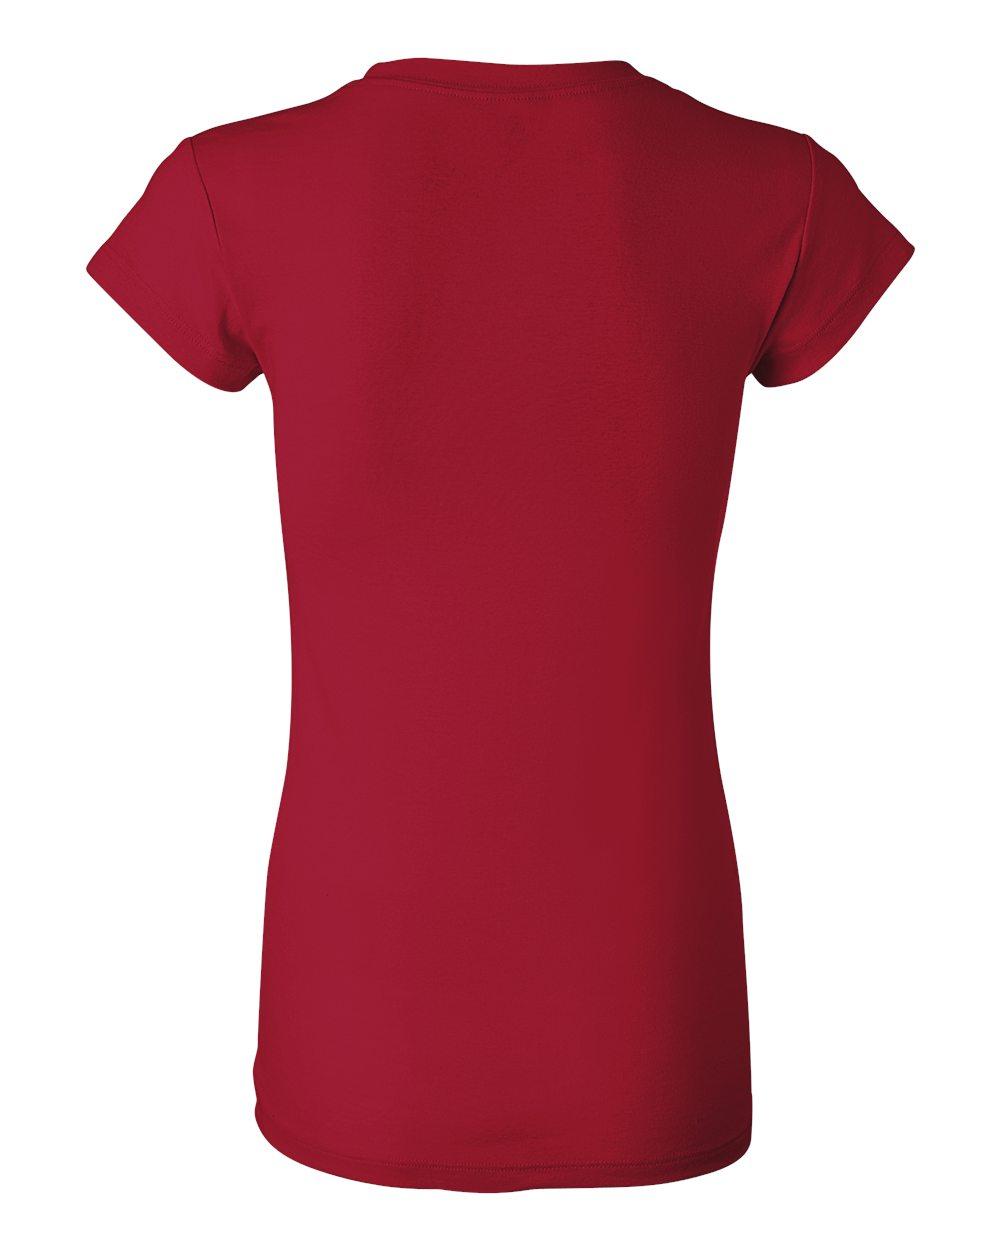 Bella-Canvas-Women-039-s-Sheer-Mini-Rib-Short-Sleeve-T-Shirt-8701-S-2XL thumbnail 10